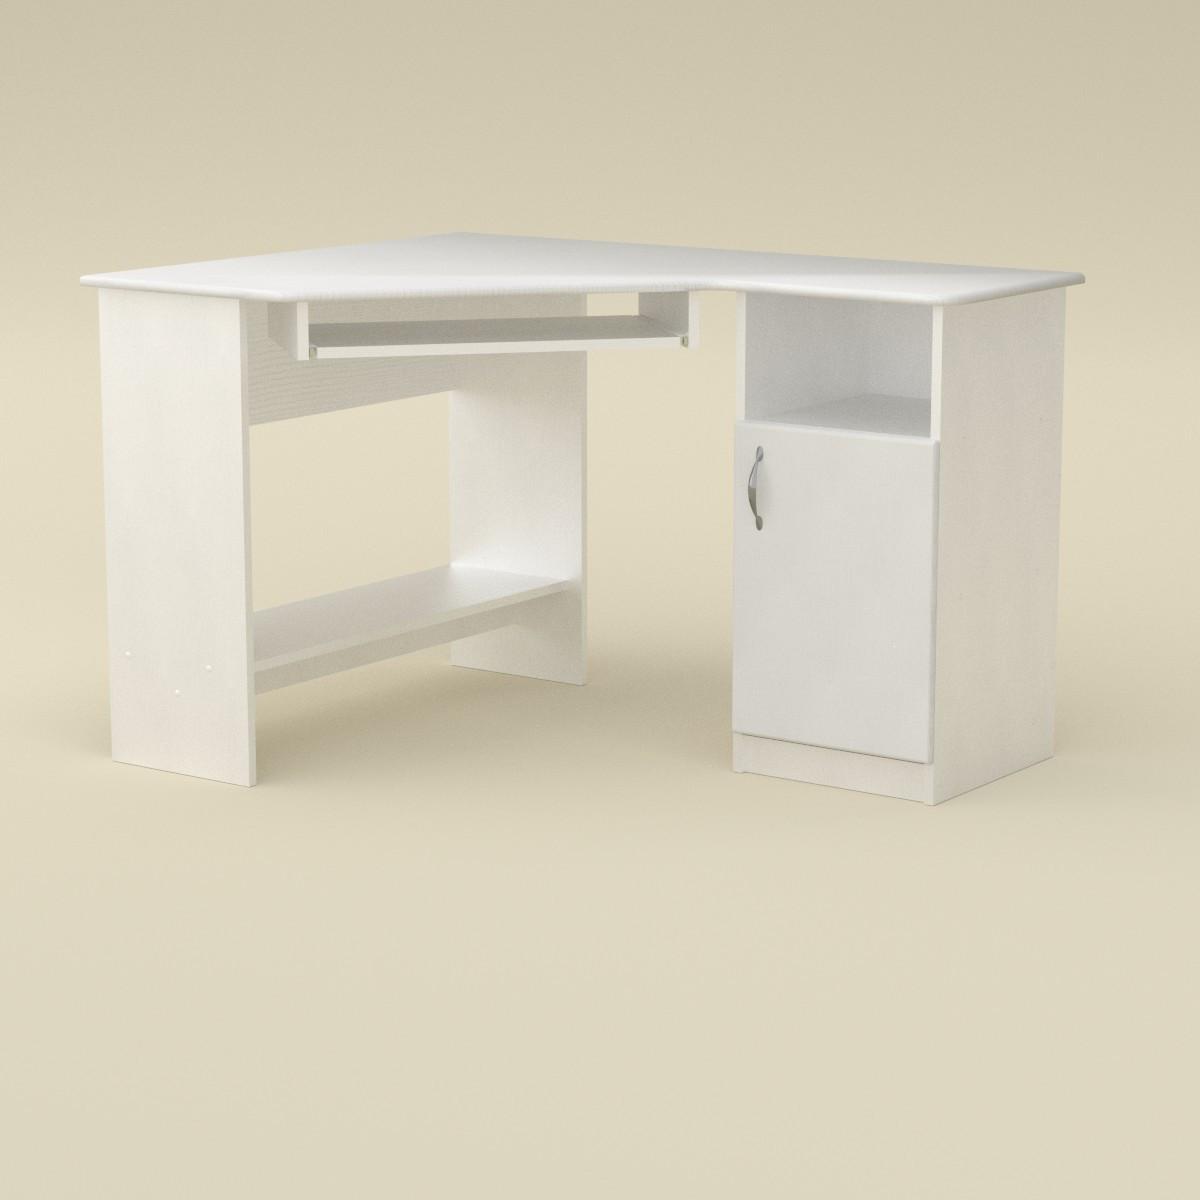 Стол компьютерный СУ-13 МДФ белый Компанит (120х90х75 см)